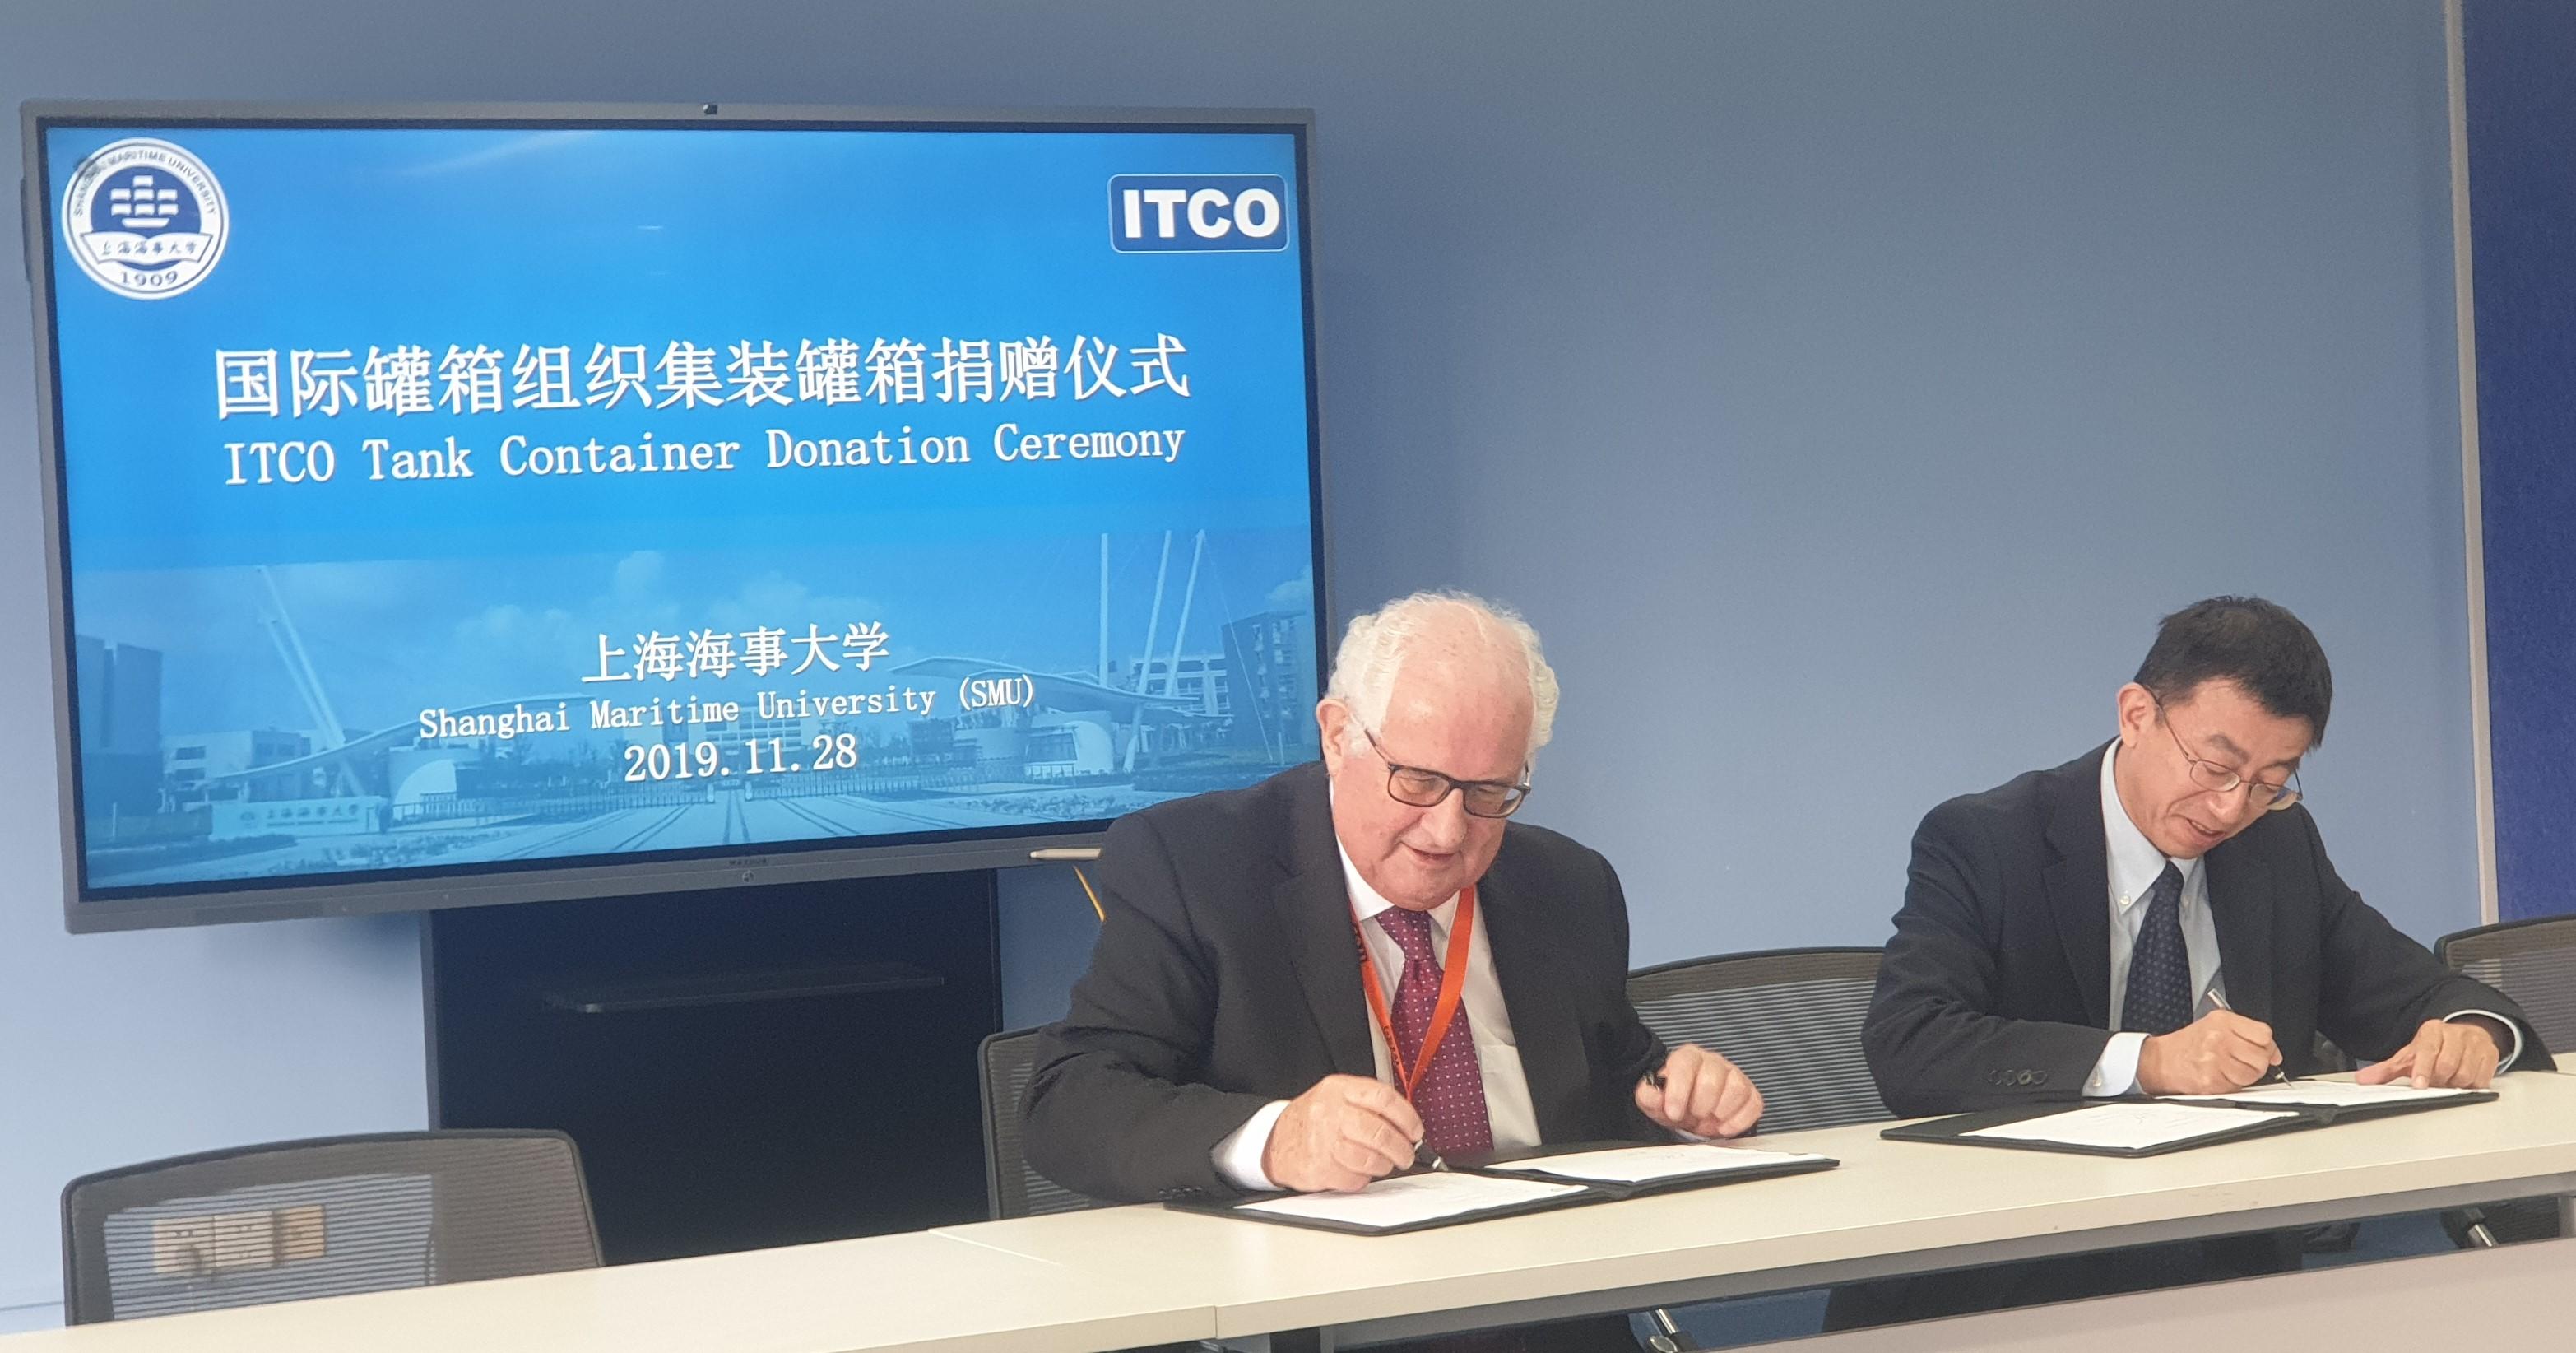 Pic B ITCO SMU Signing Ceremony.jpg